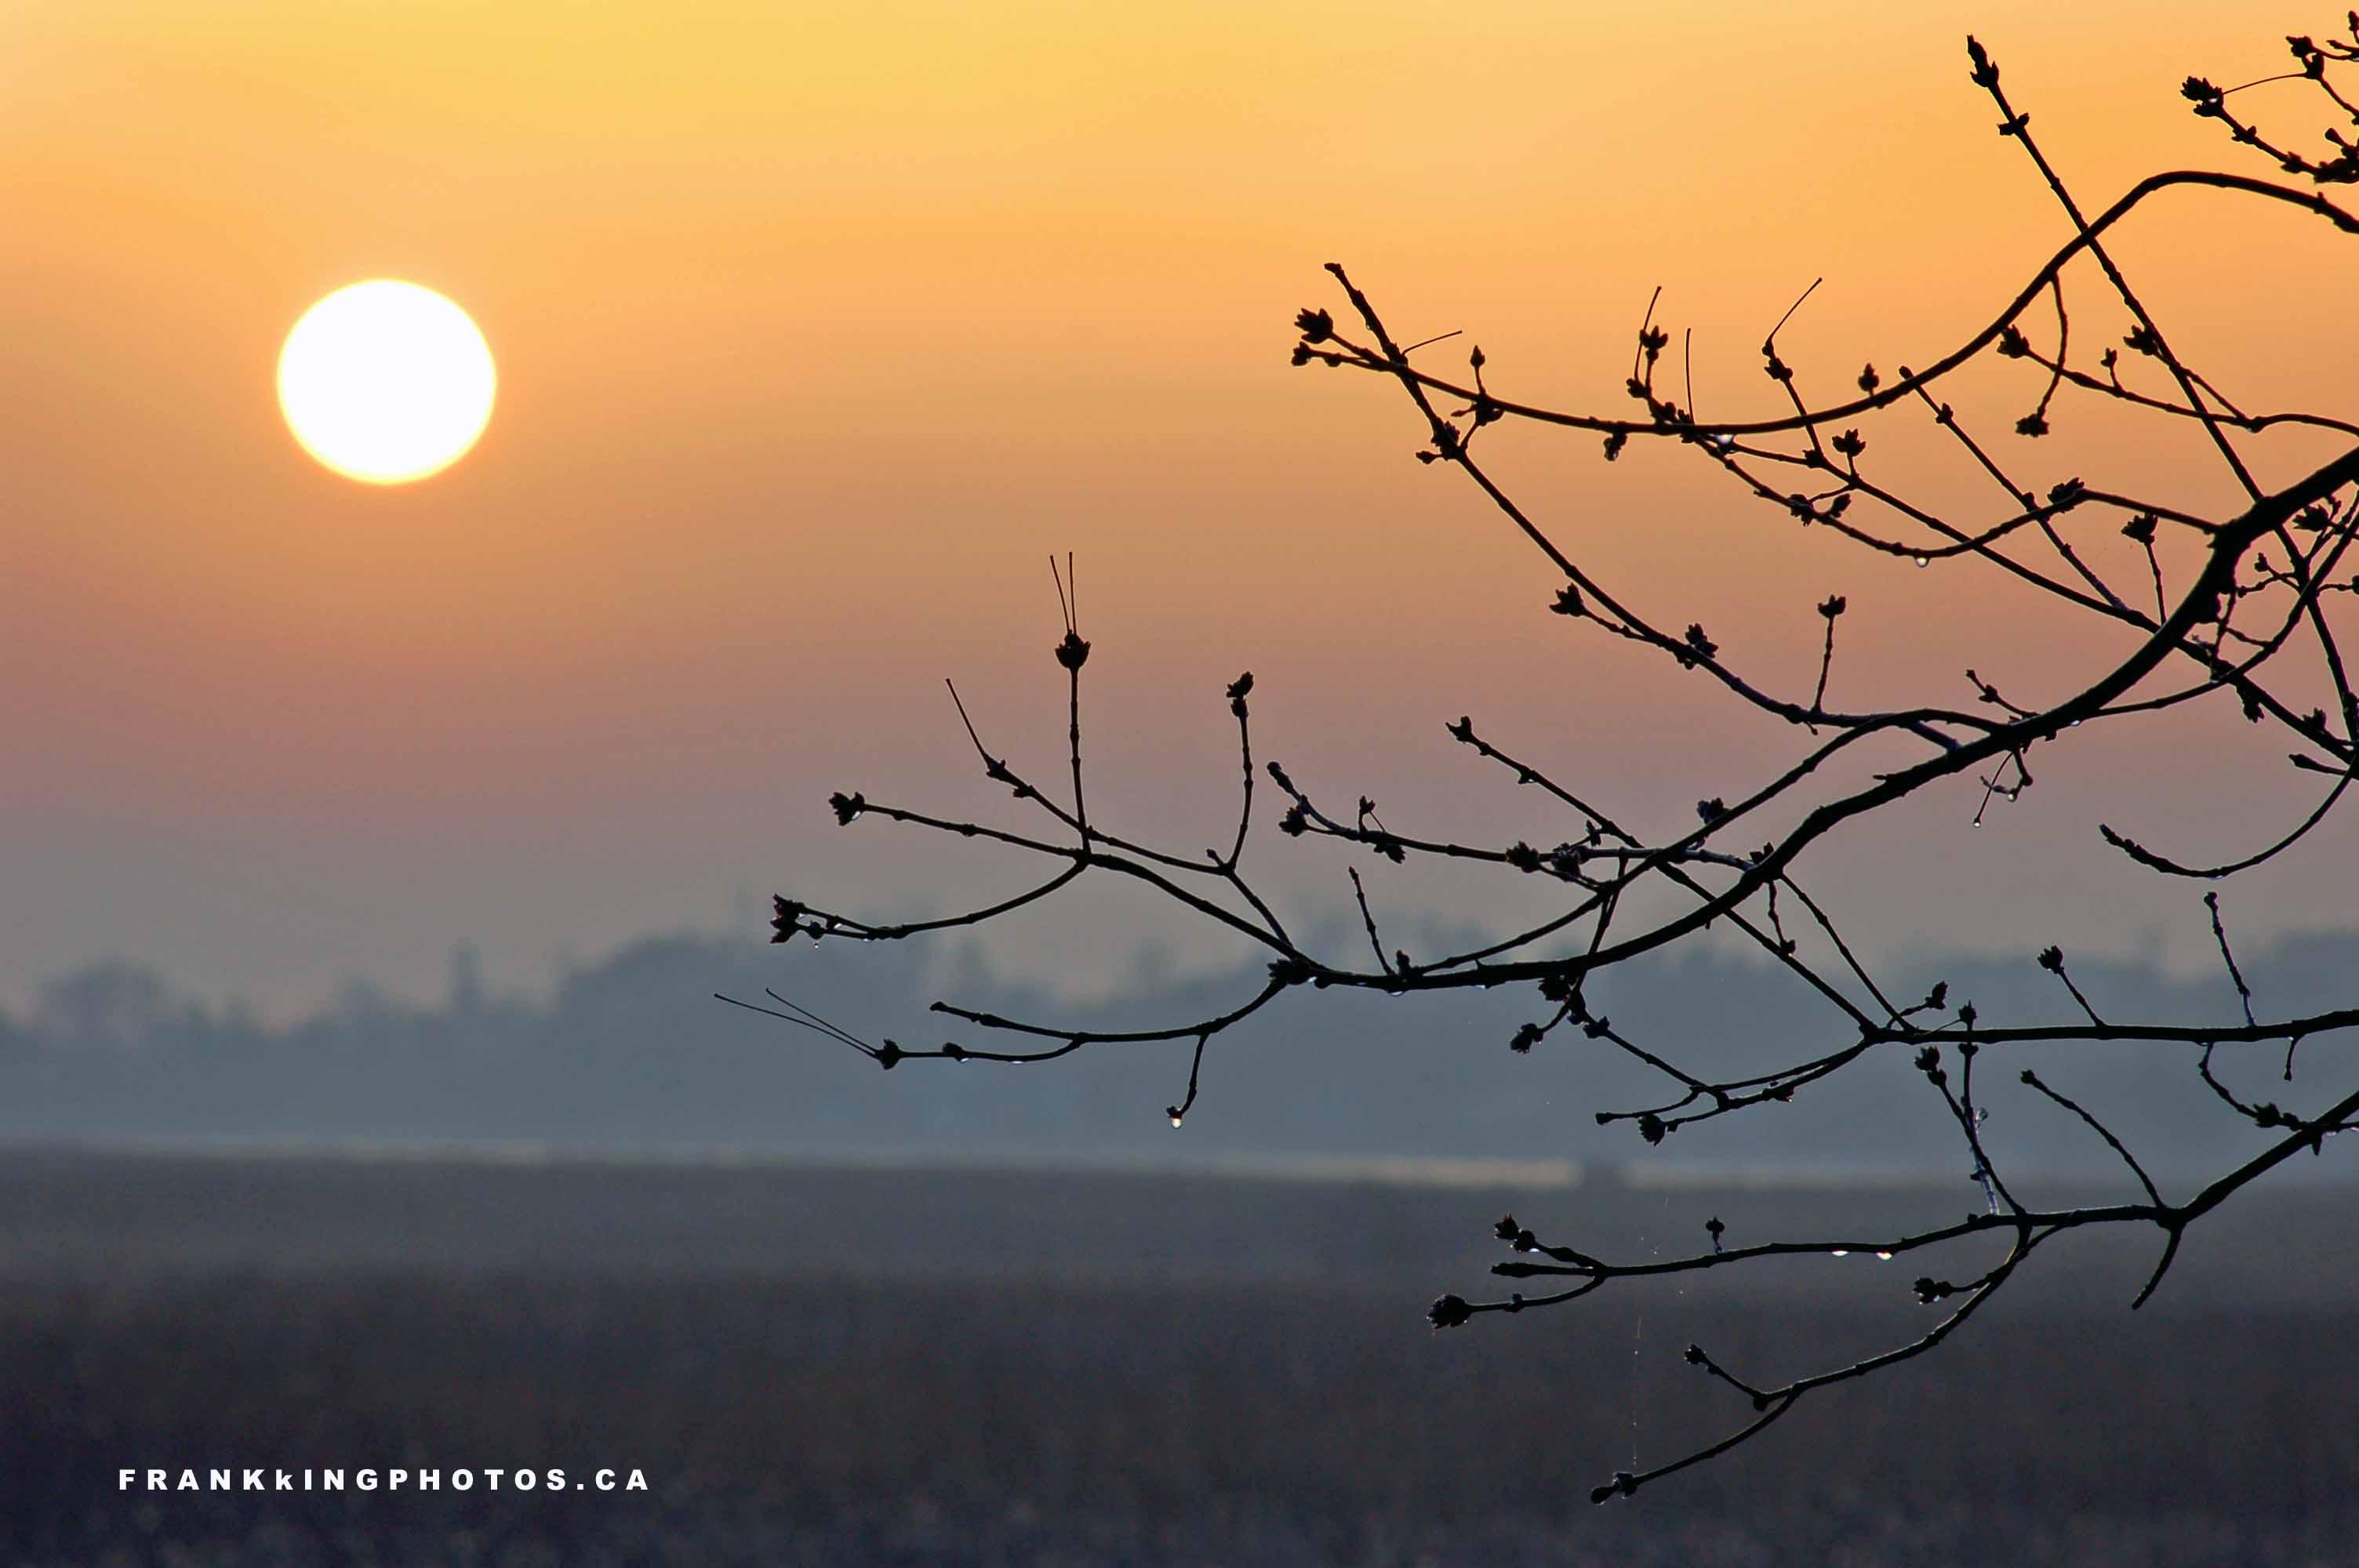 Natural Landscapes The Misty Mornings Of Spring FRANK